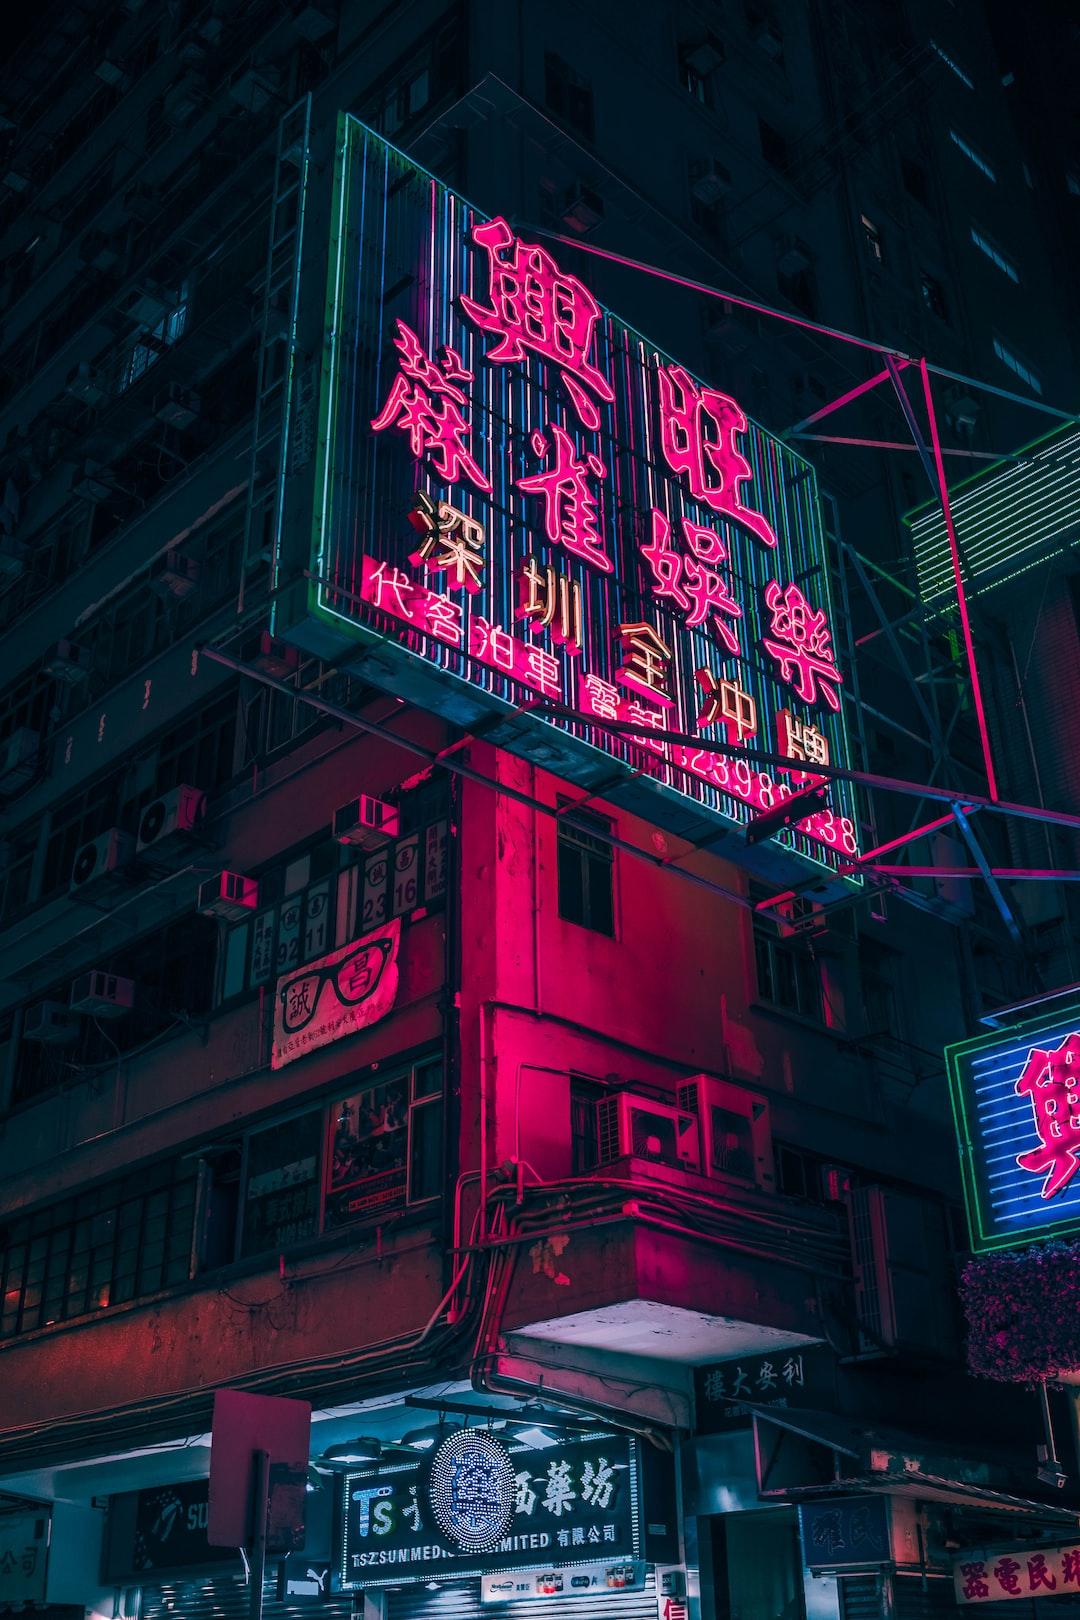 Neon Dreams Photo By Ryan Tang Ryz0n On Unsplash